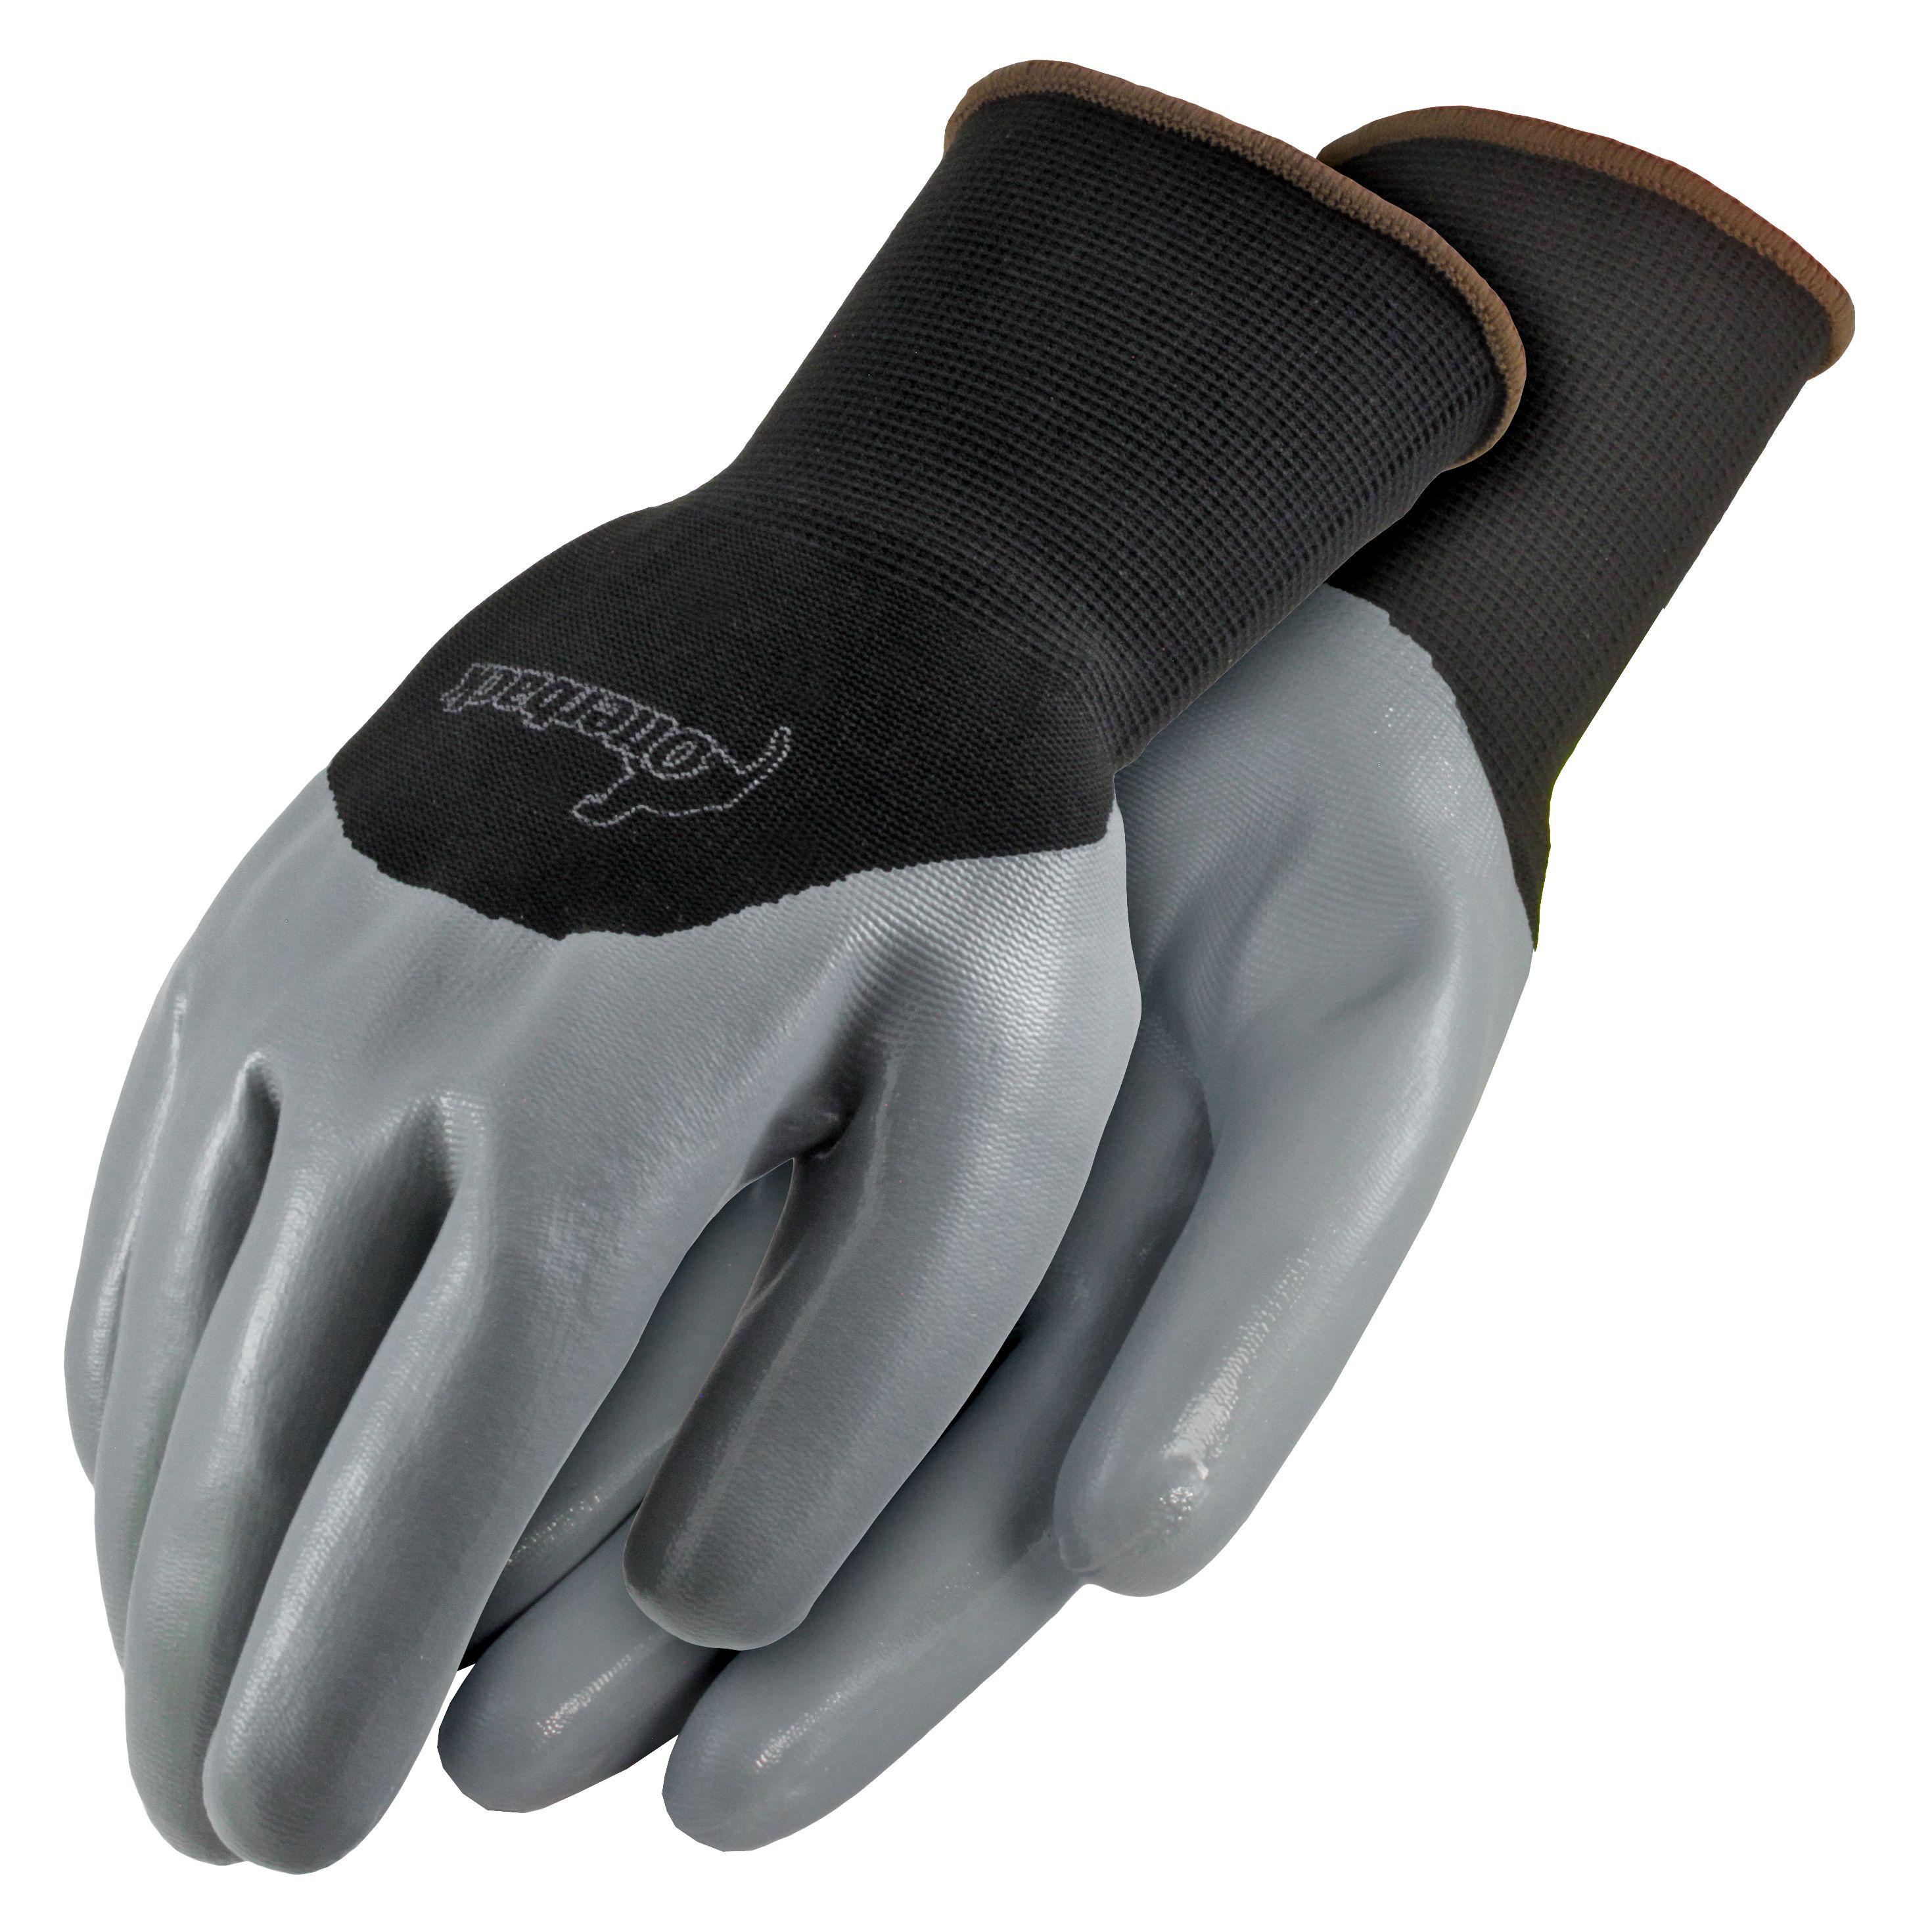 otterback-nitrile-palm-coated-knit-gloves